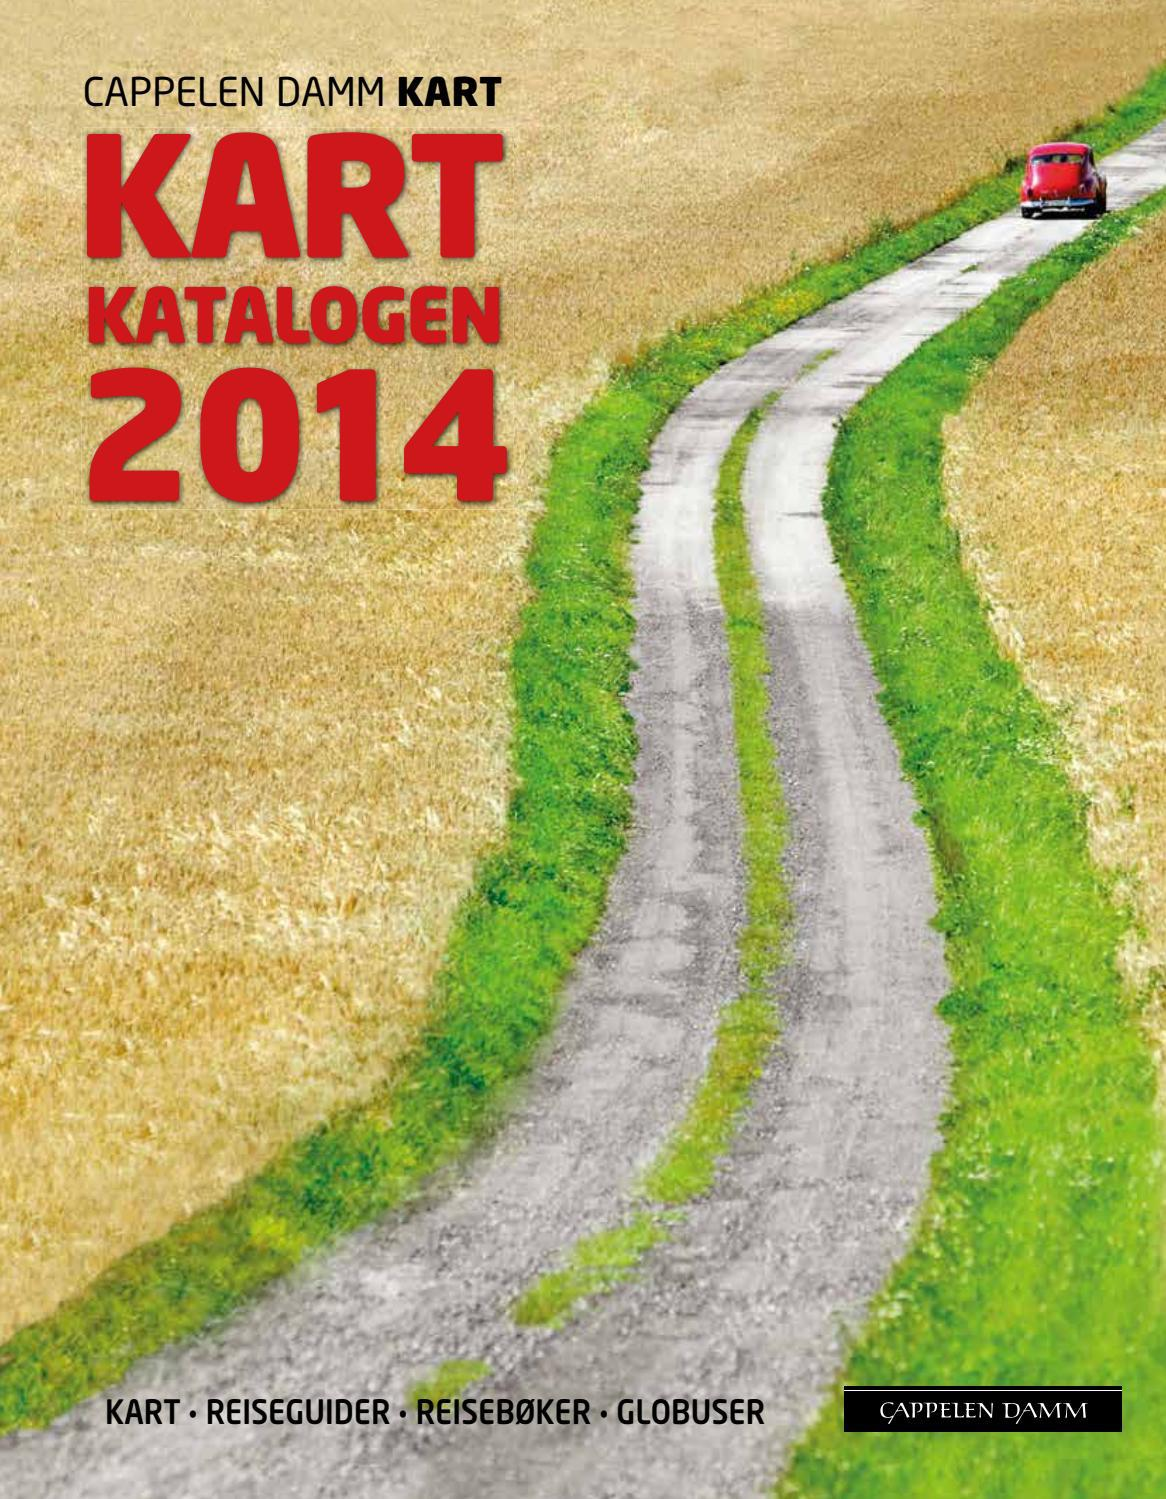 Kartkatalog2014 By Cappelen Damm As Issuu